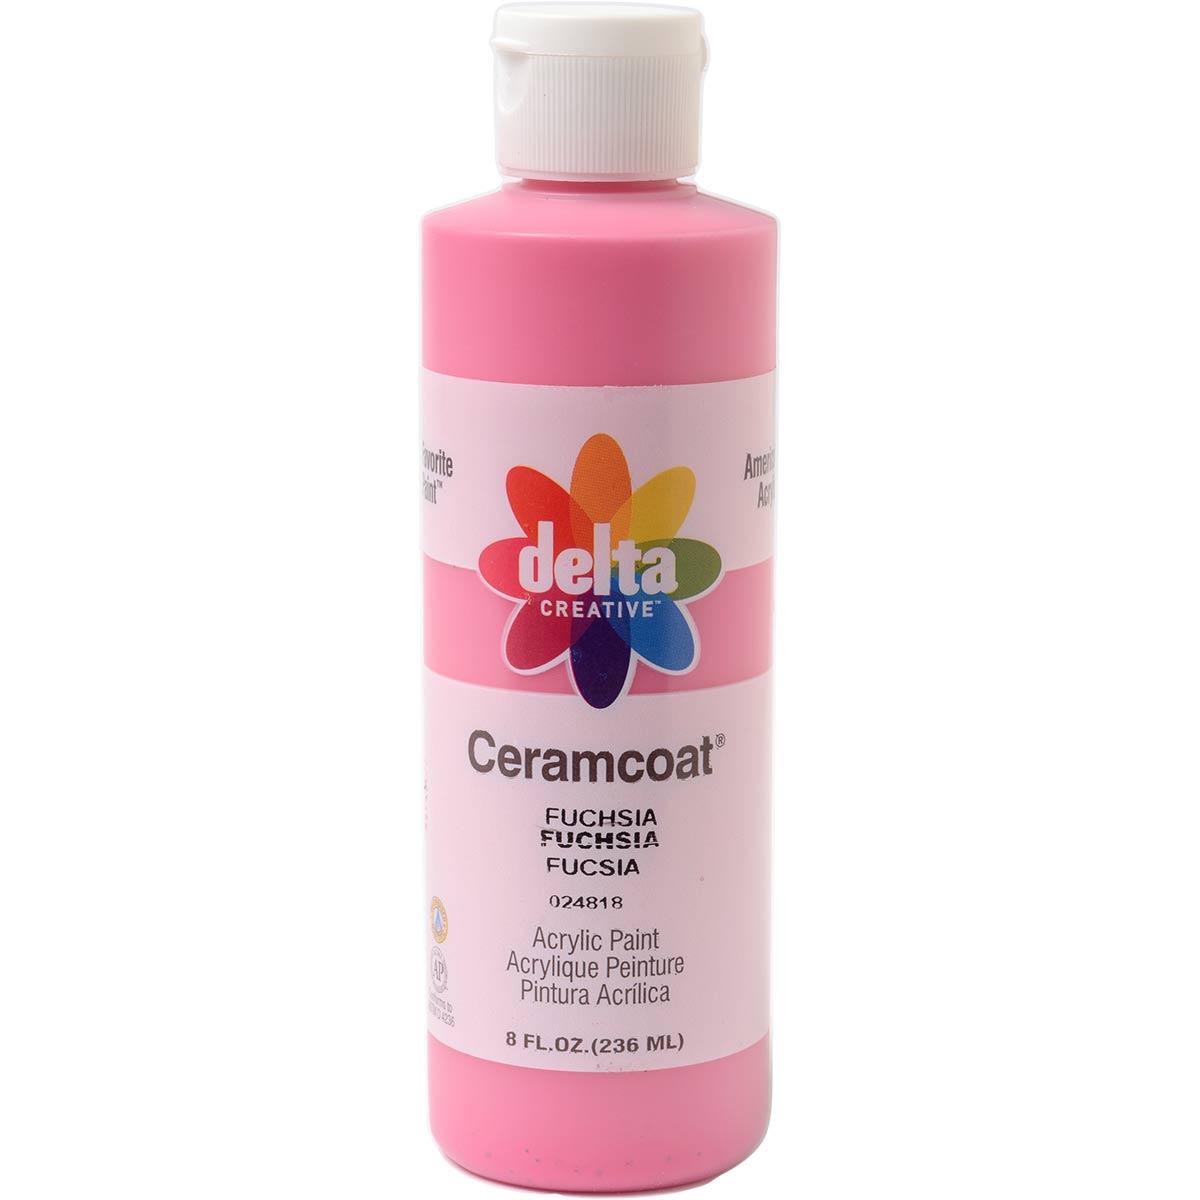 Delta Ceramcoat ® Acrylic Paint - Fuchsia, 8 oz.